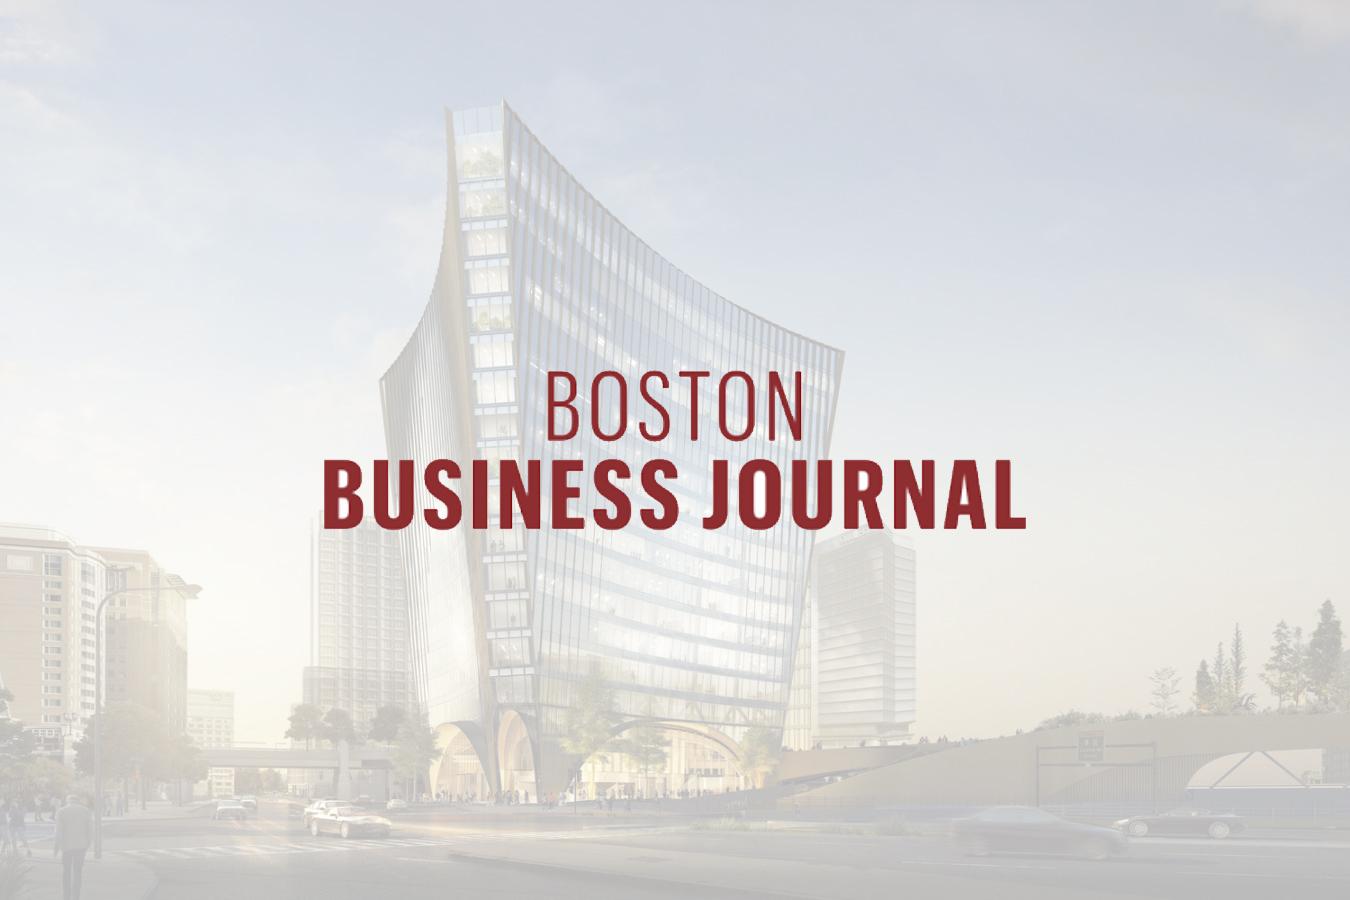 Boston Business Journal: BGI's New Seaport Office